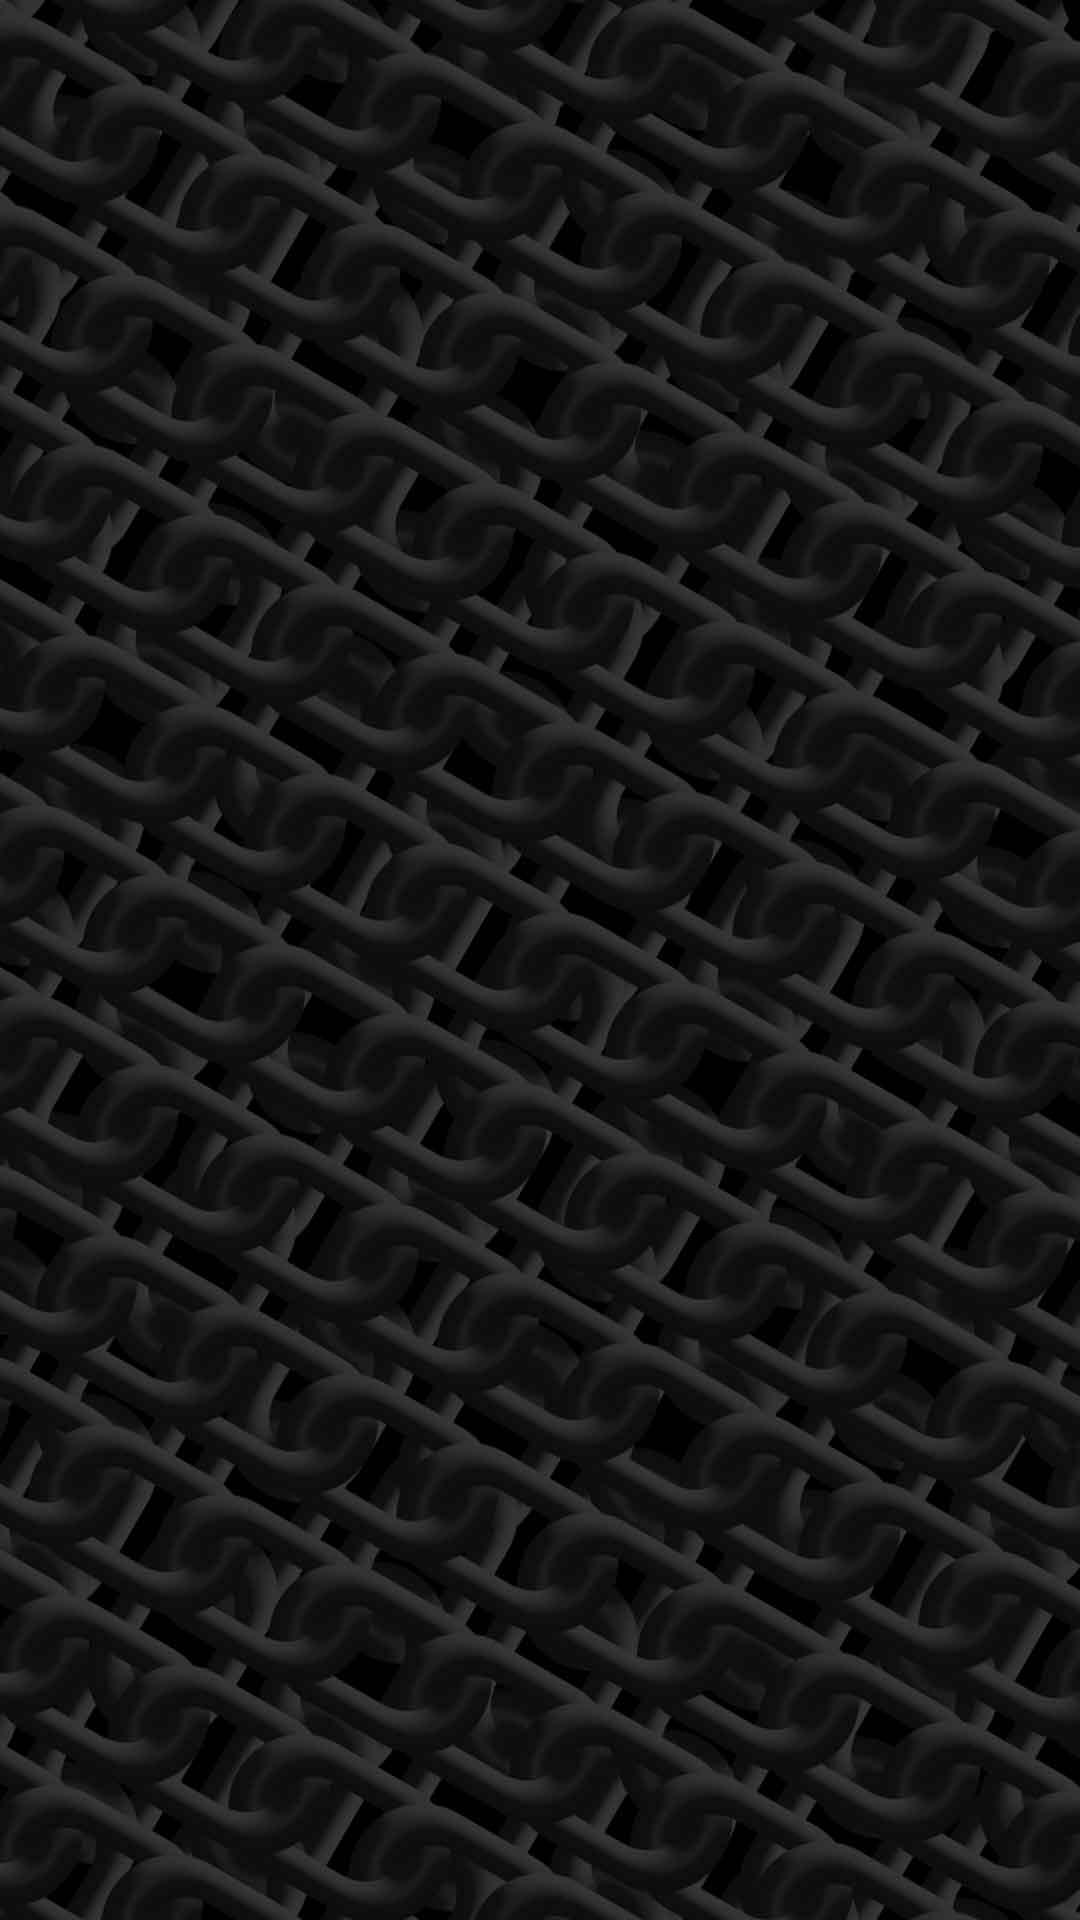 black picture wallpaper